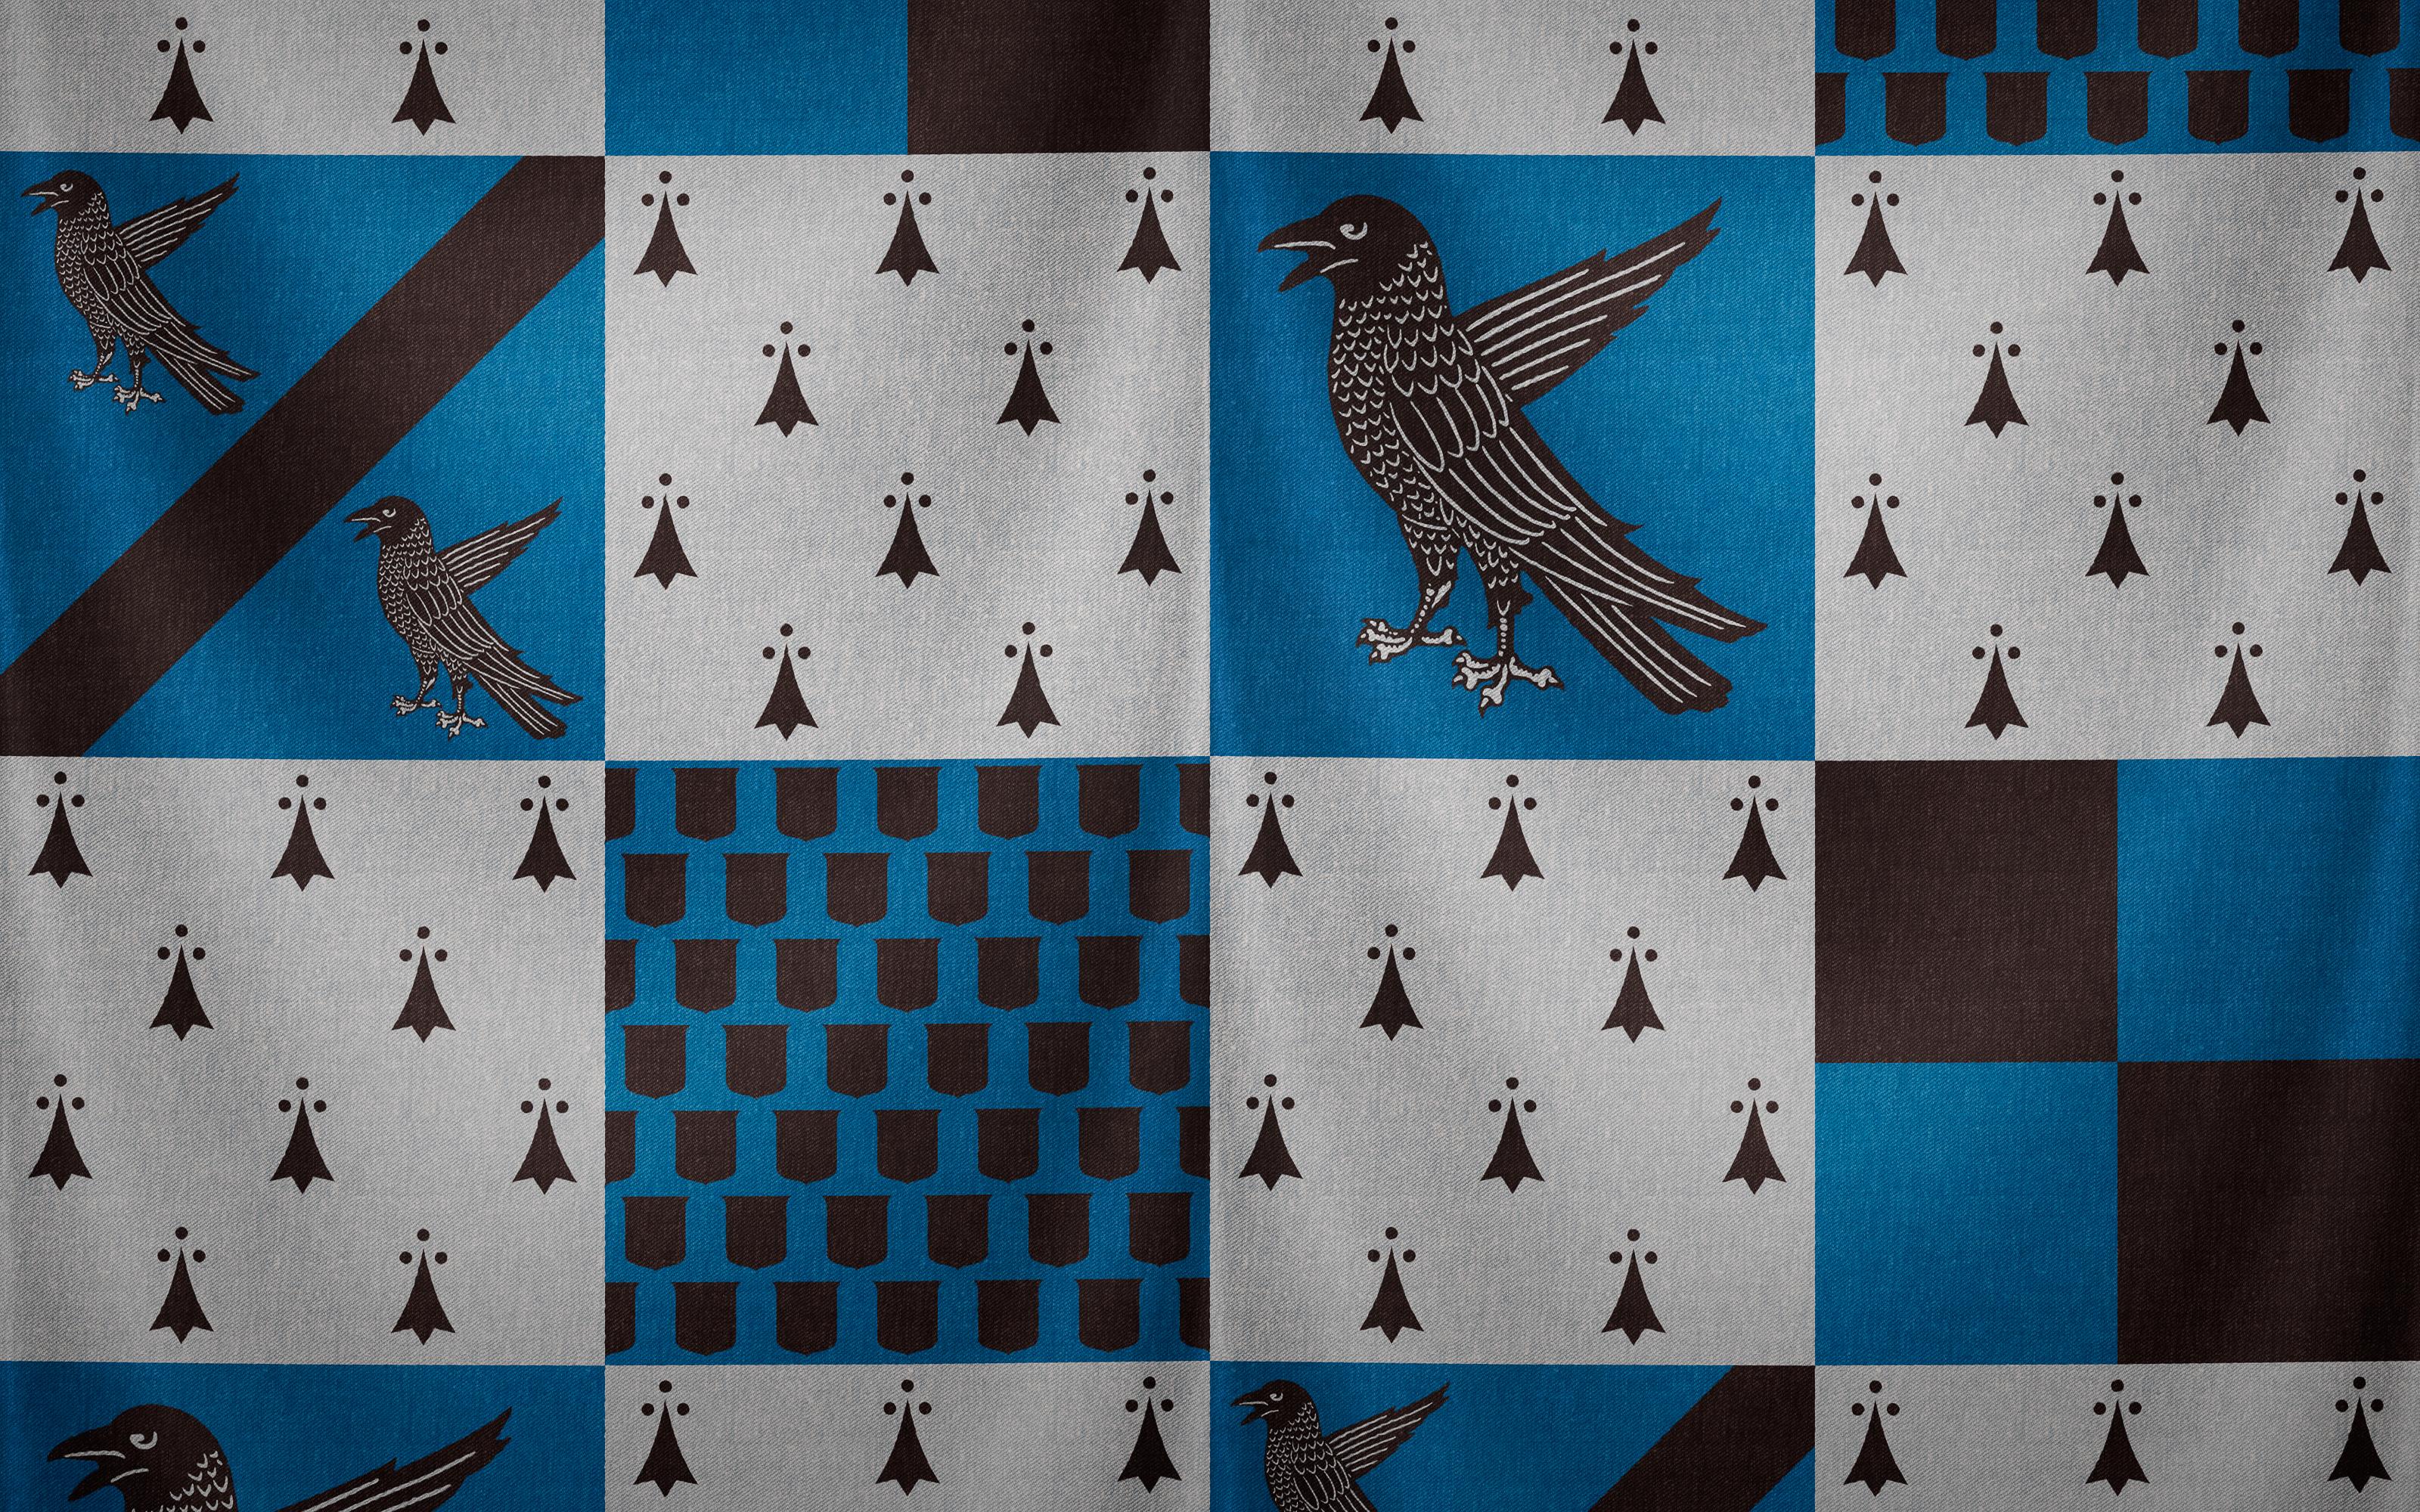 Harry Potter Ravenclaw Wallpaper Wallpapersafari